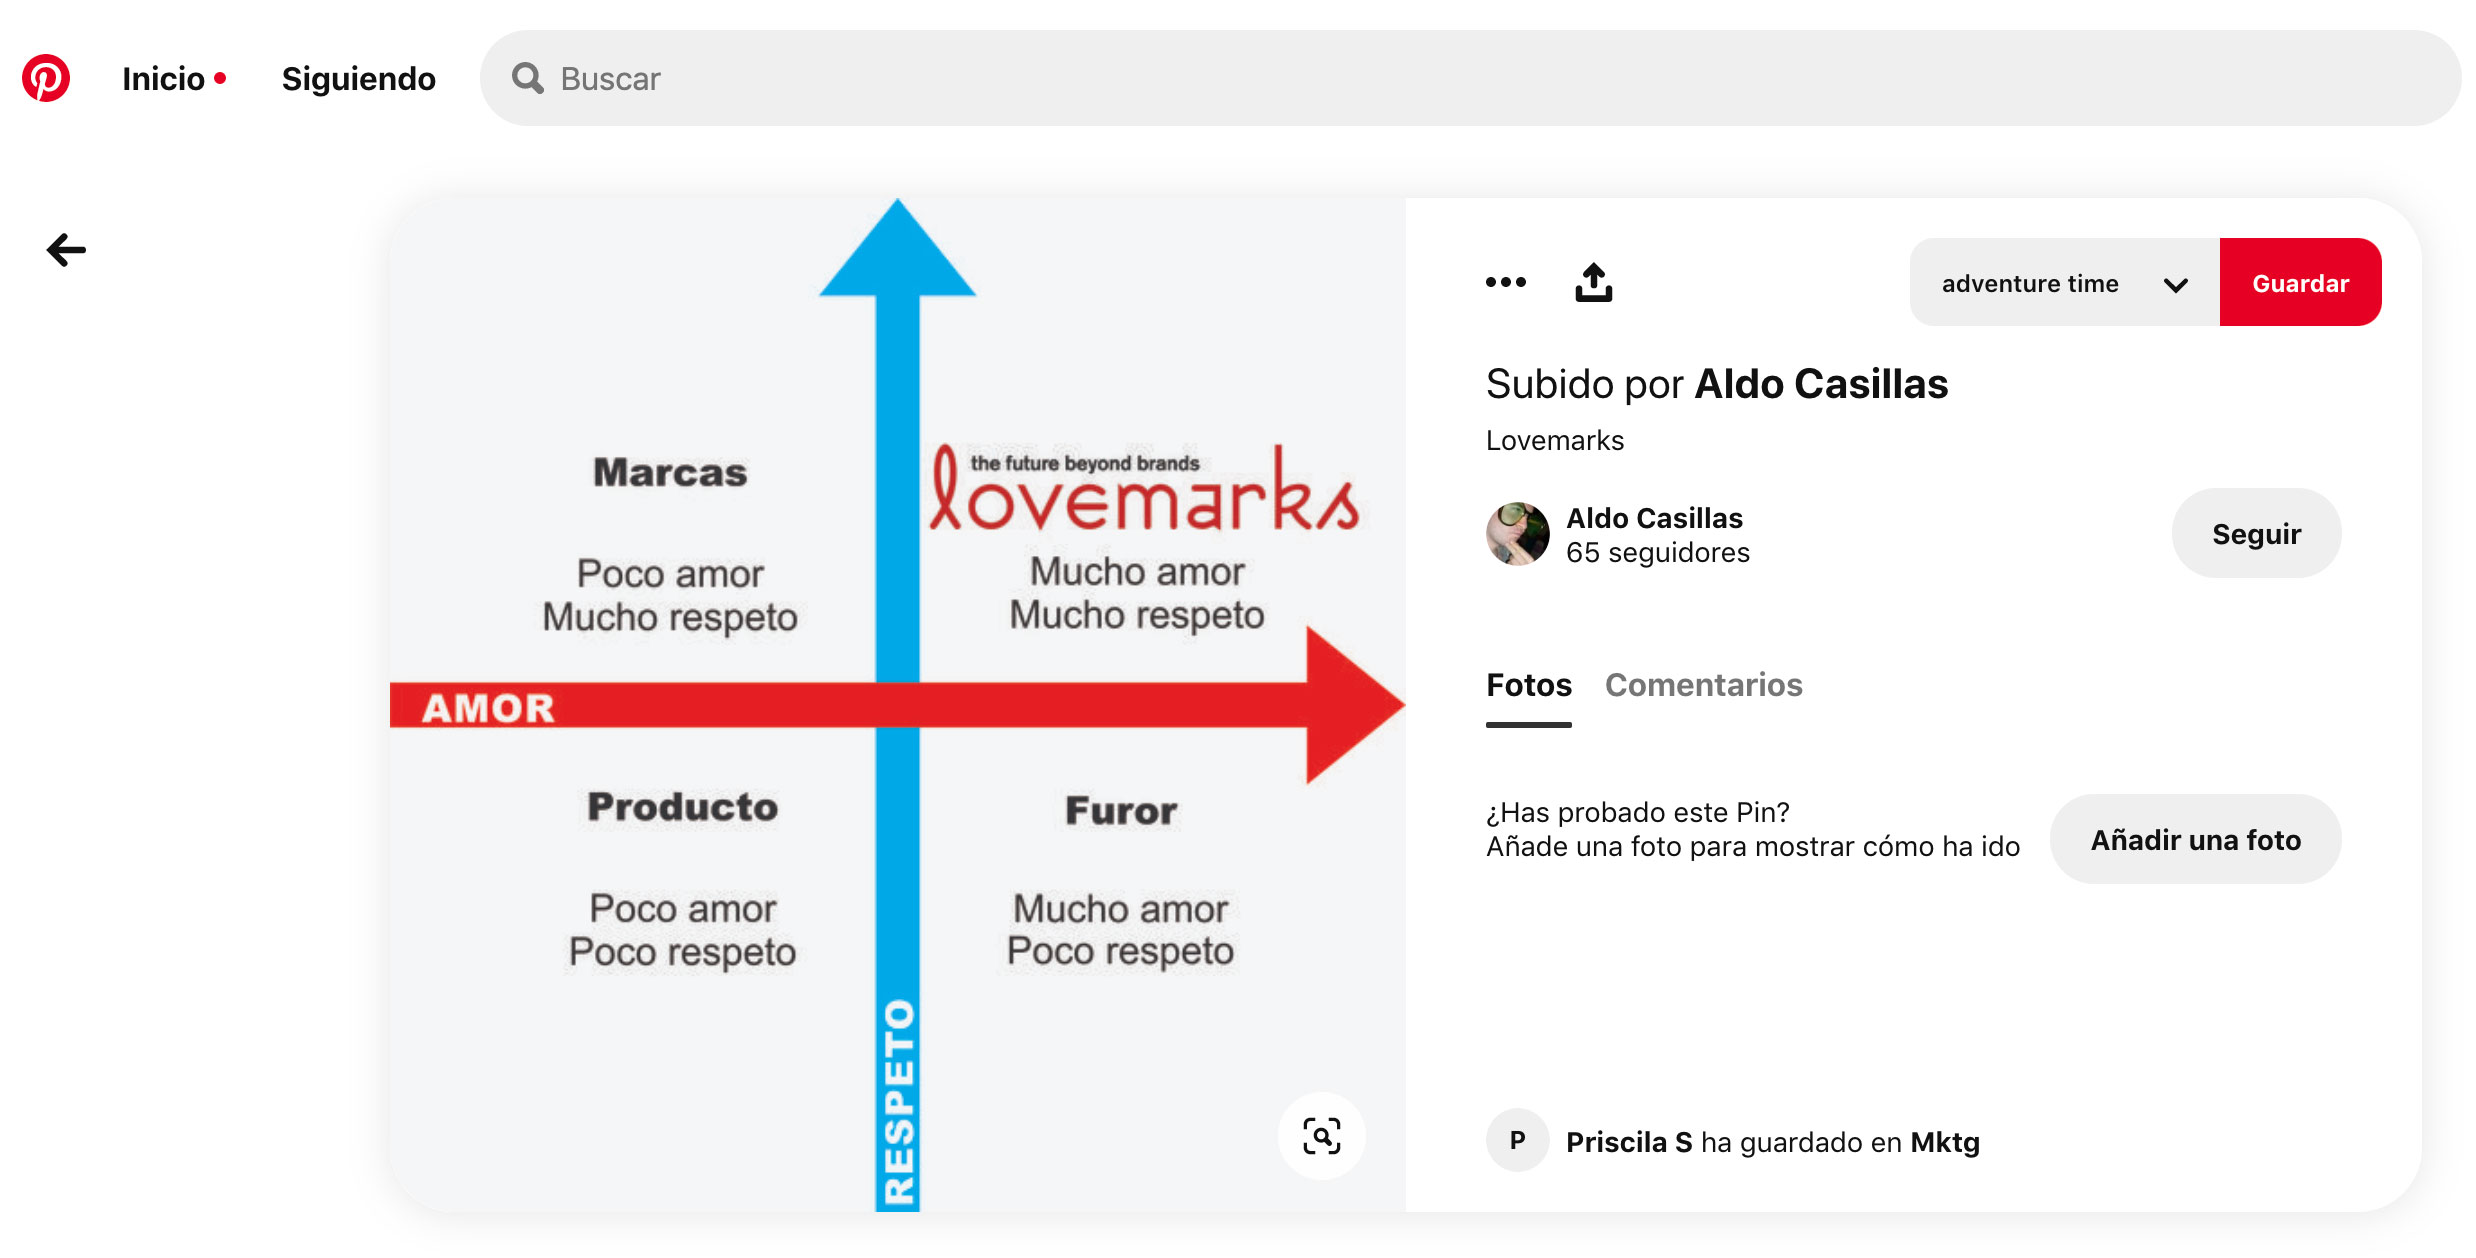 Posicionamiento de marca. Mapa lovemark